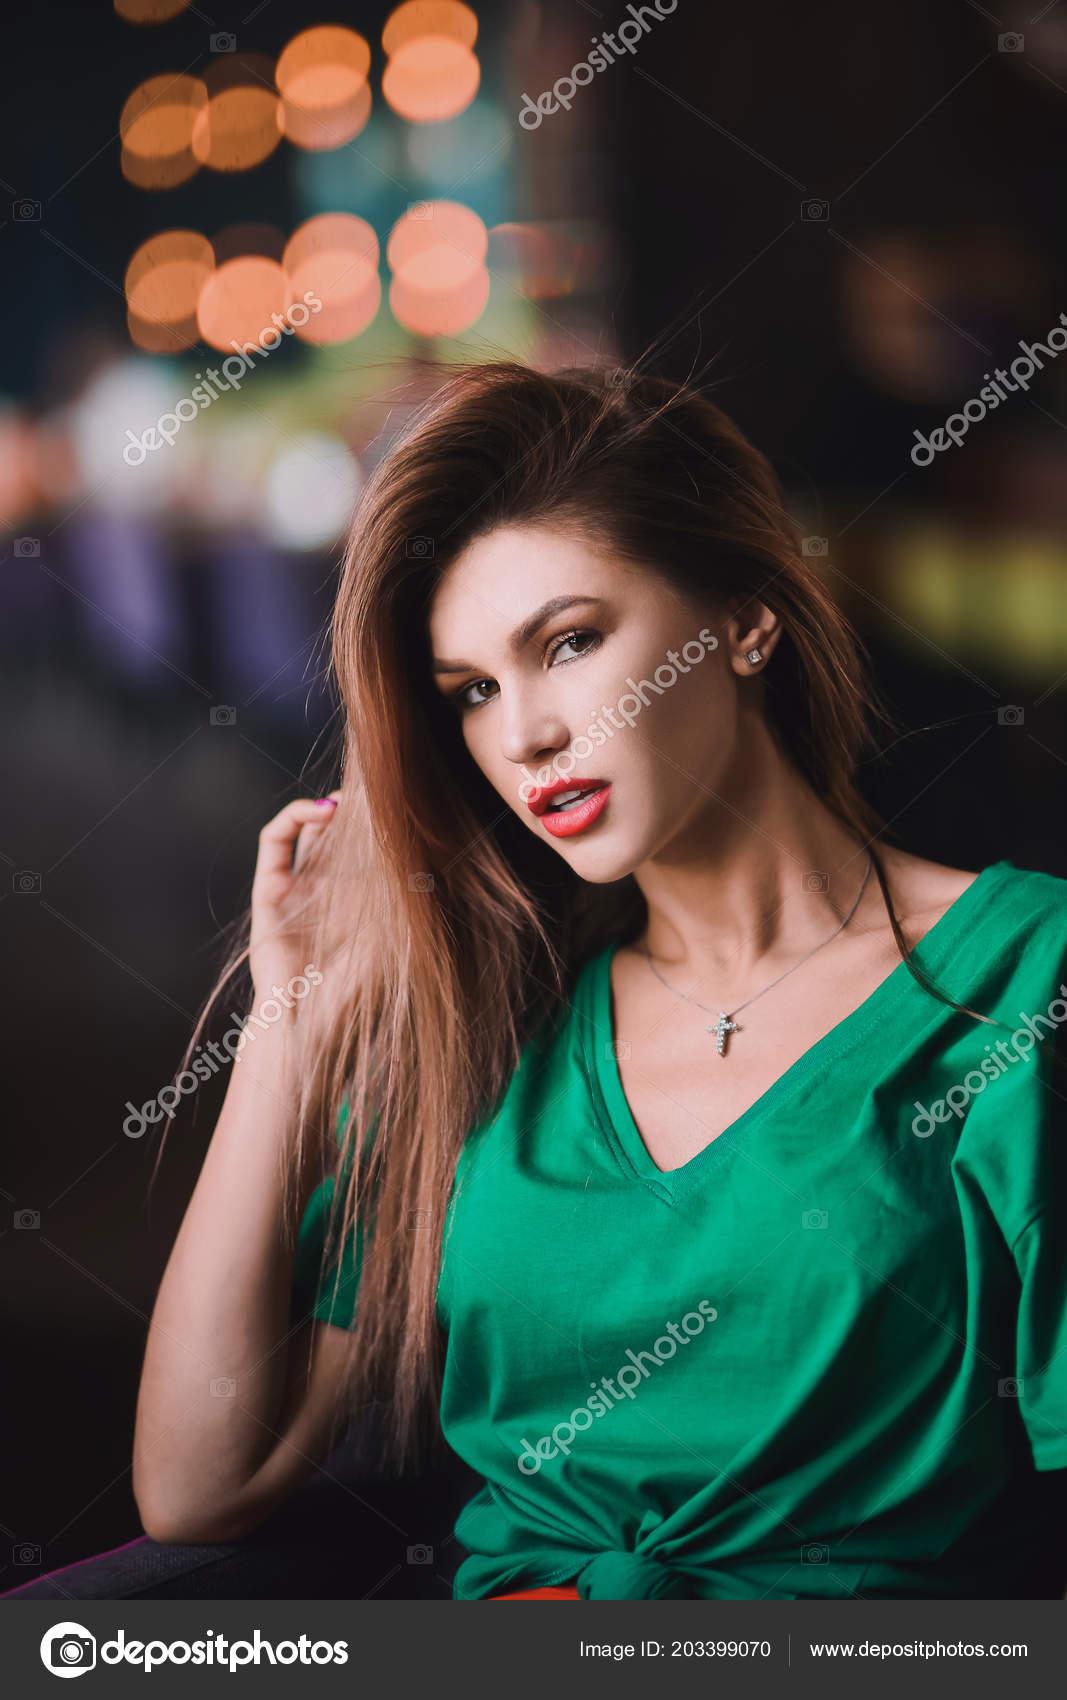 0abcbd27836a Emotional Portrait Fashion Stylish Sexy Young Hipster Blonde Woman Elegant  — Stockfoto